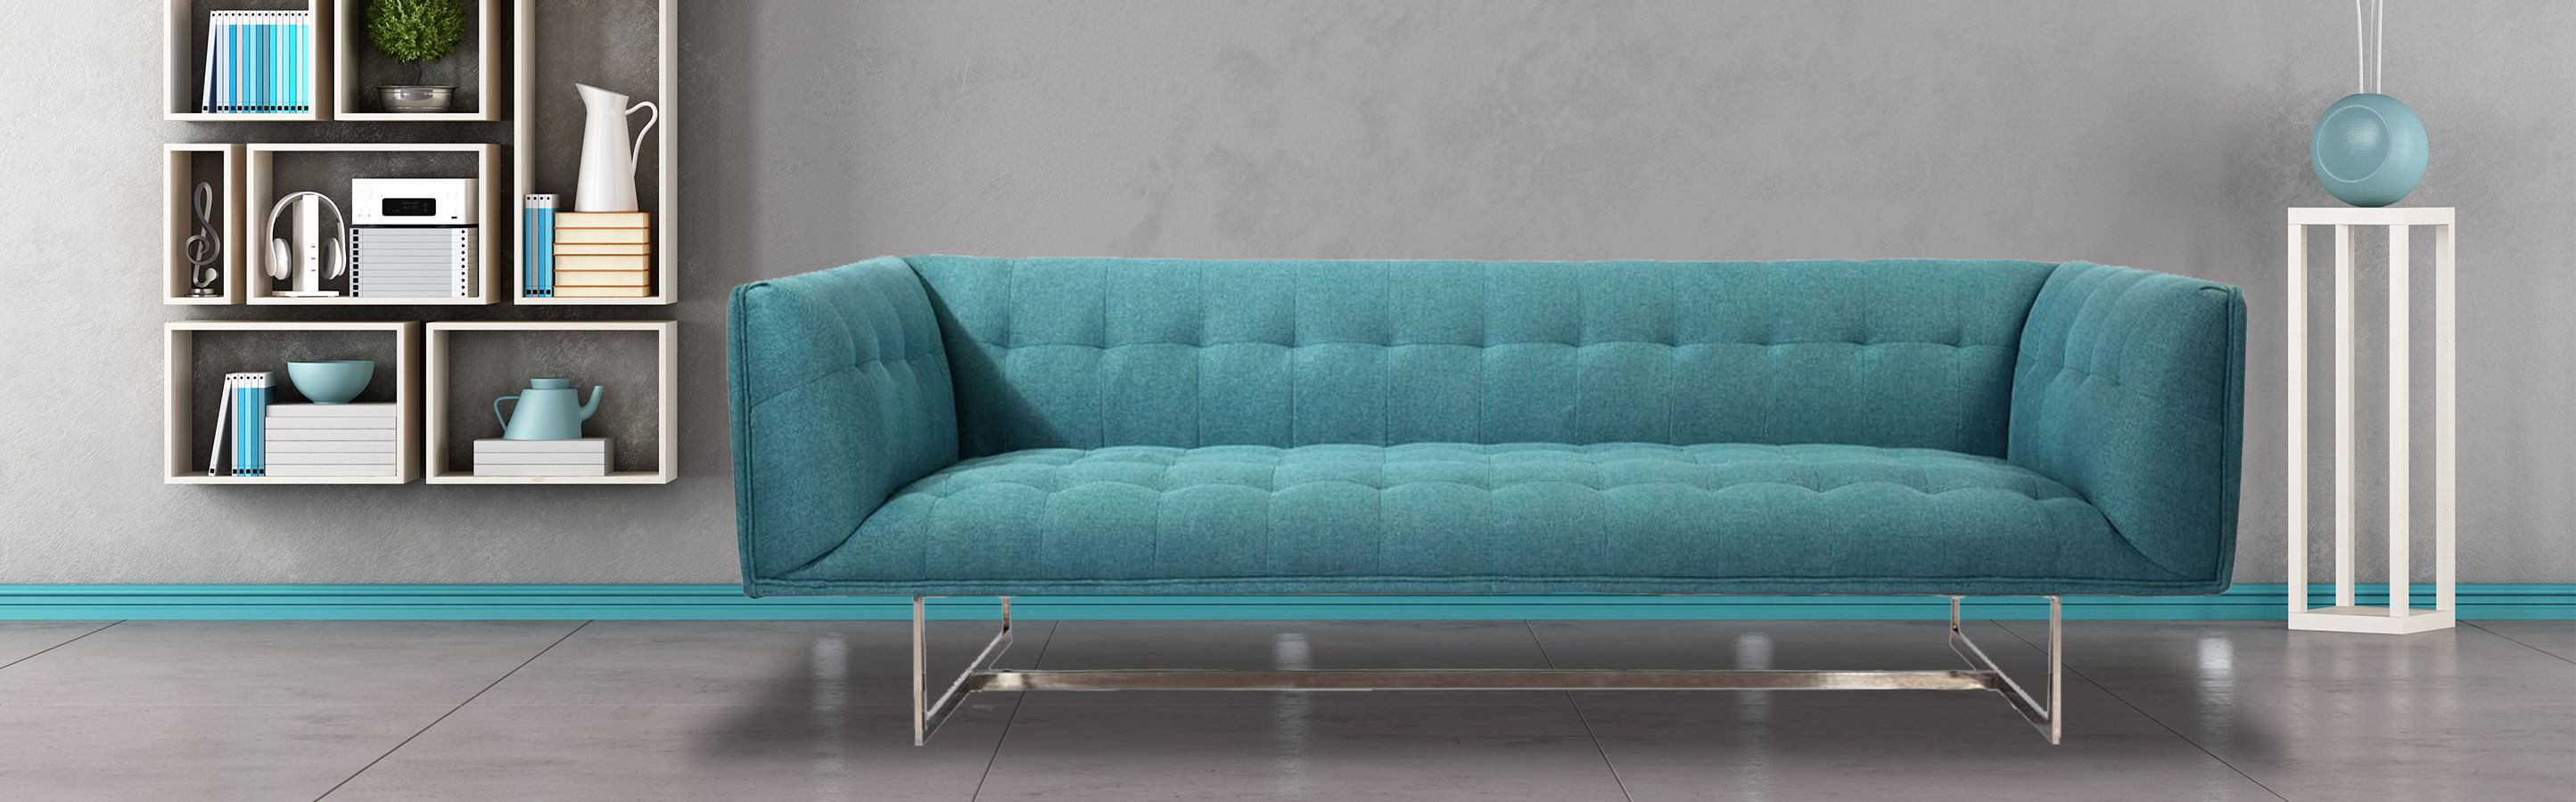 Mid Century Modern Classic Edward tufted Sofa